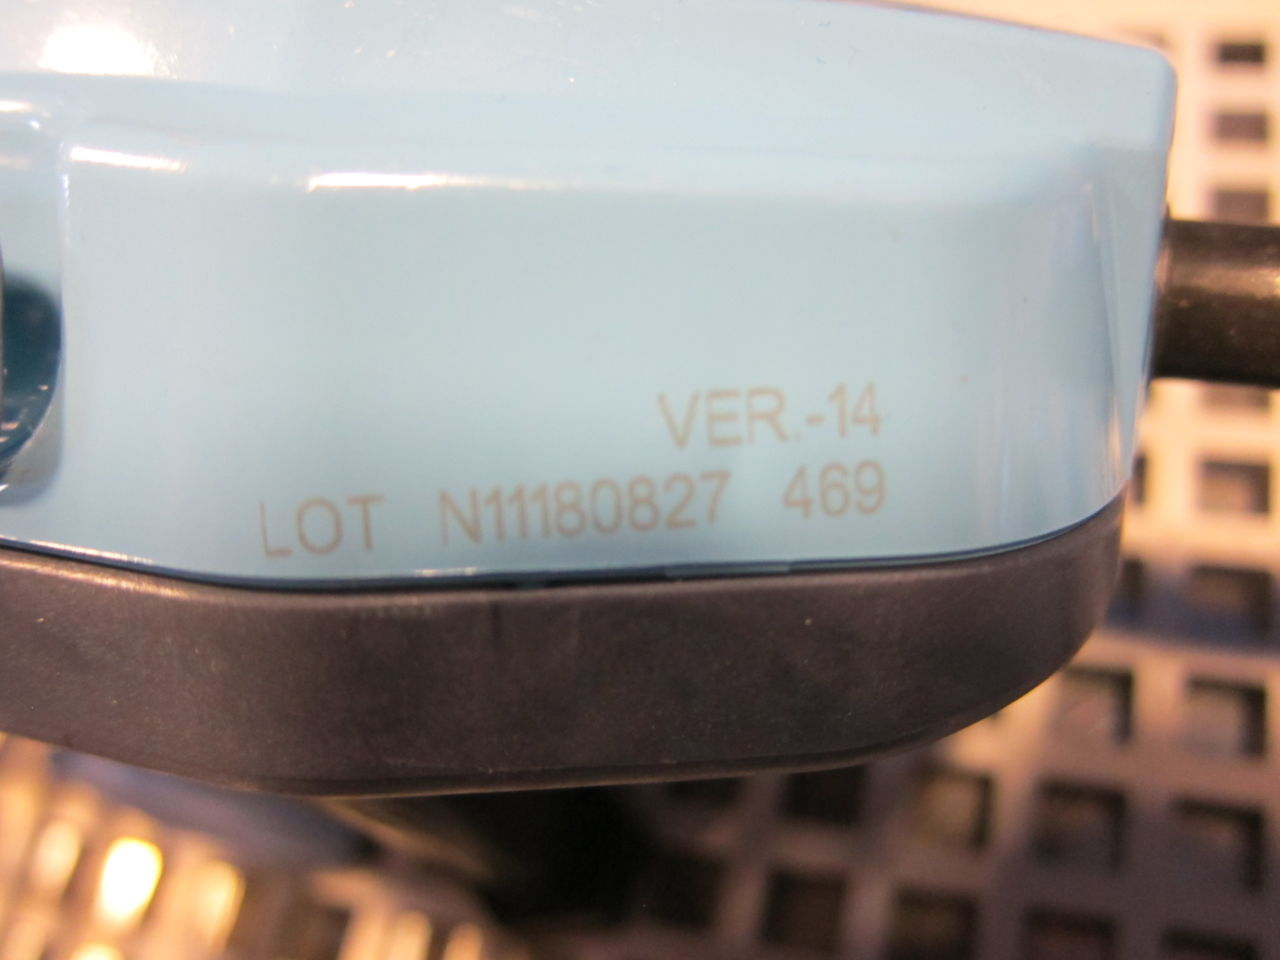 DA VINCI S SURGICAL 420093 Prograsp Forceps